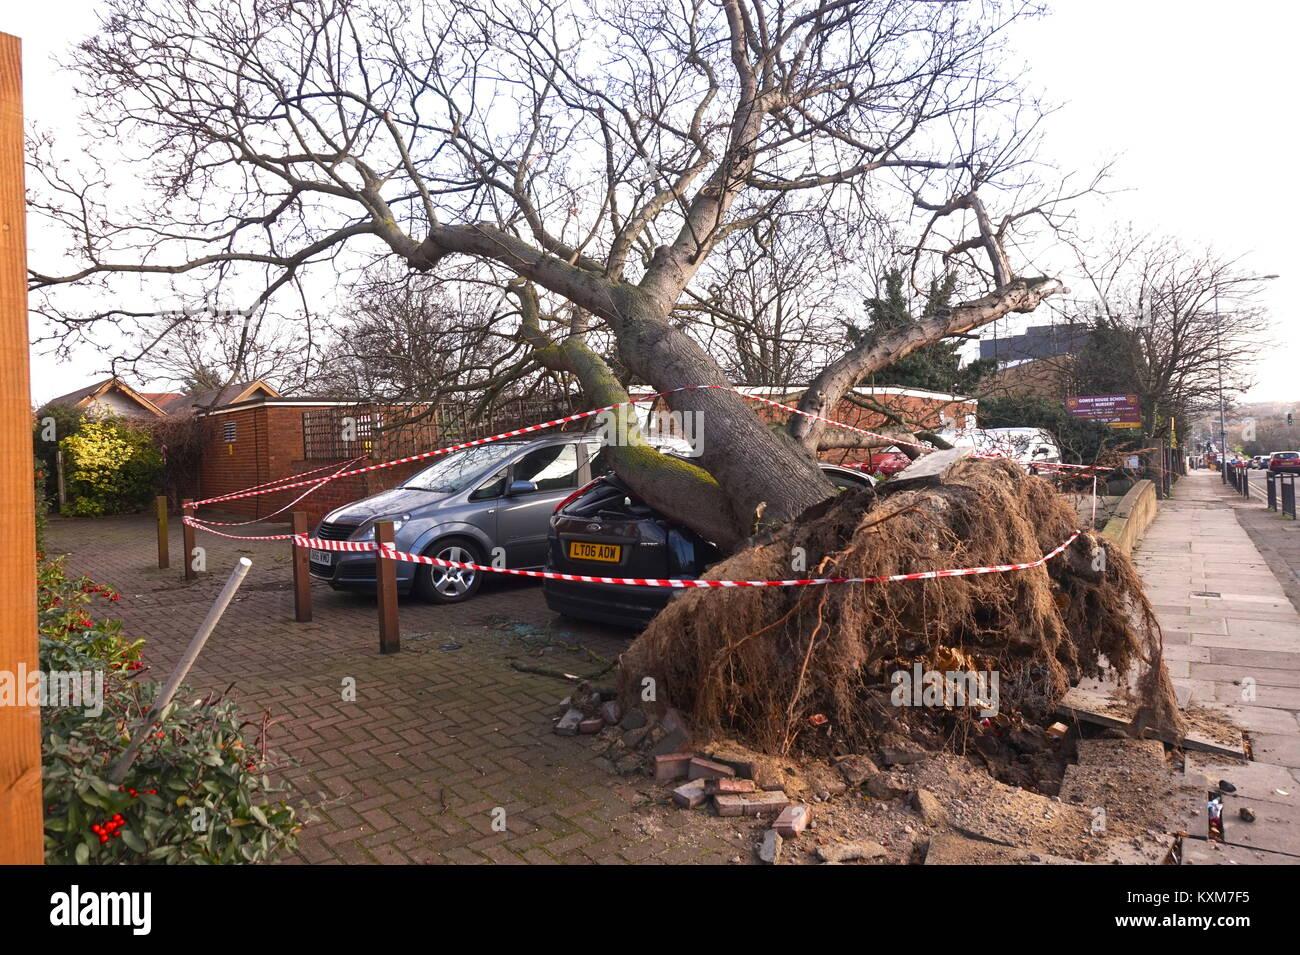 Giant tree falls onto car in Neasden, London, England Stock Photo